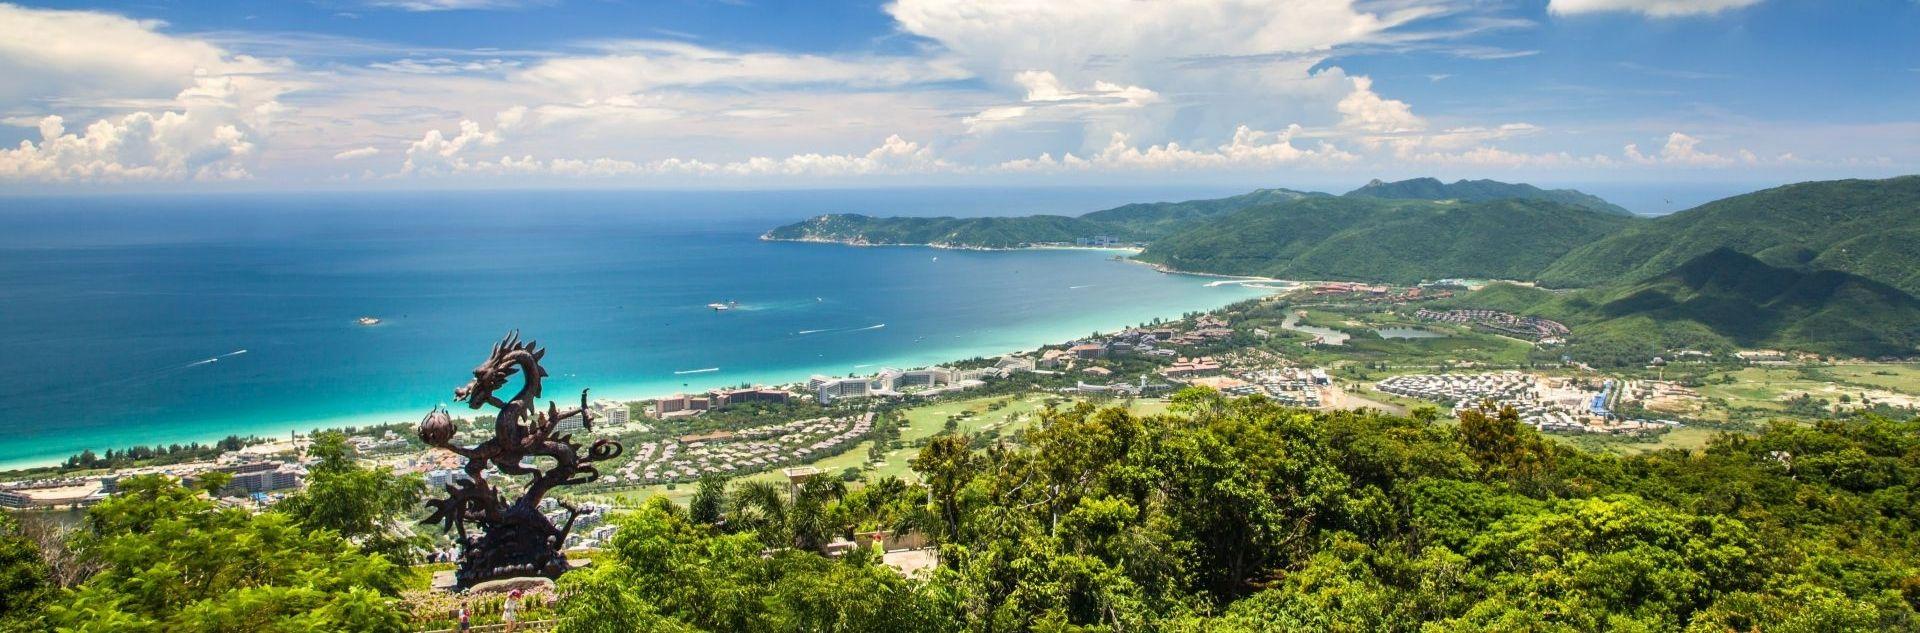 Hainan Küste